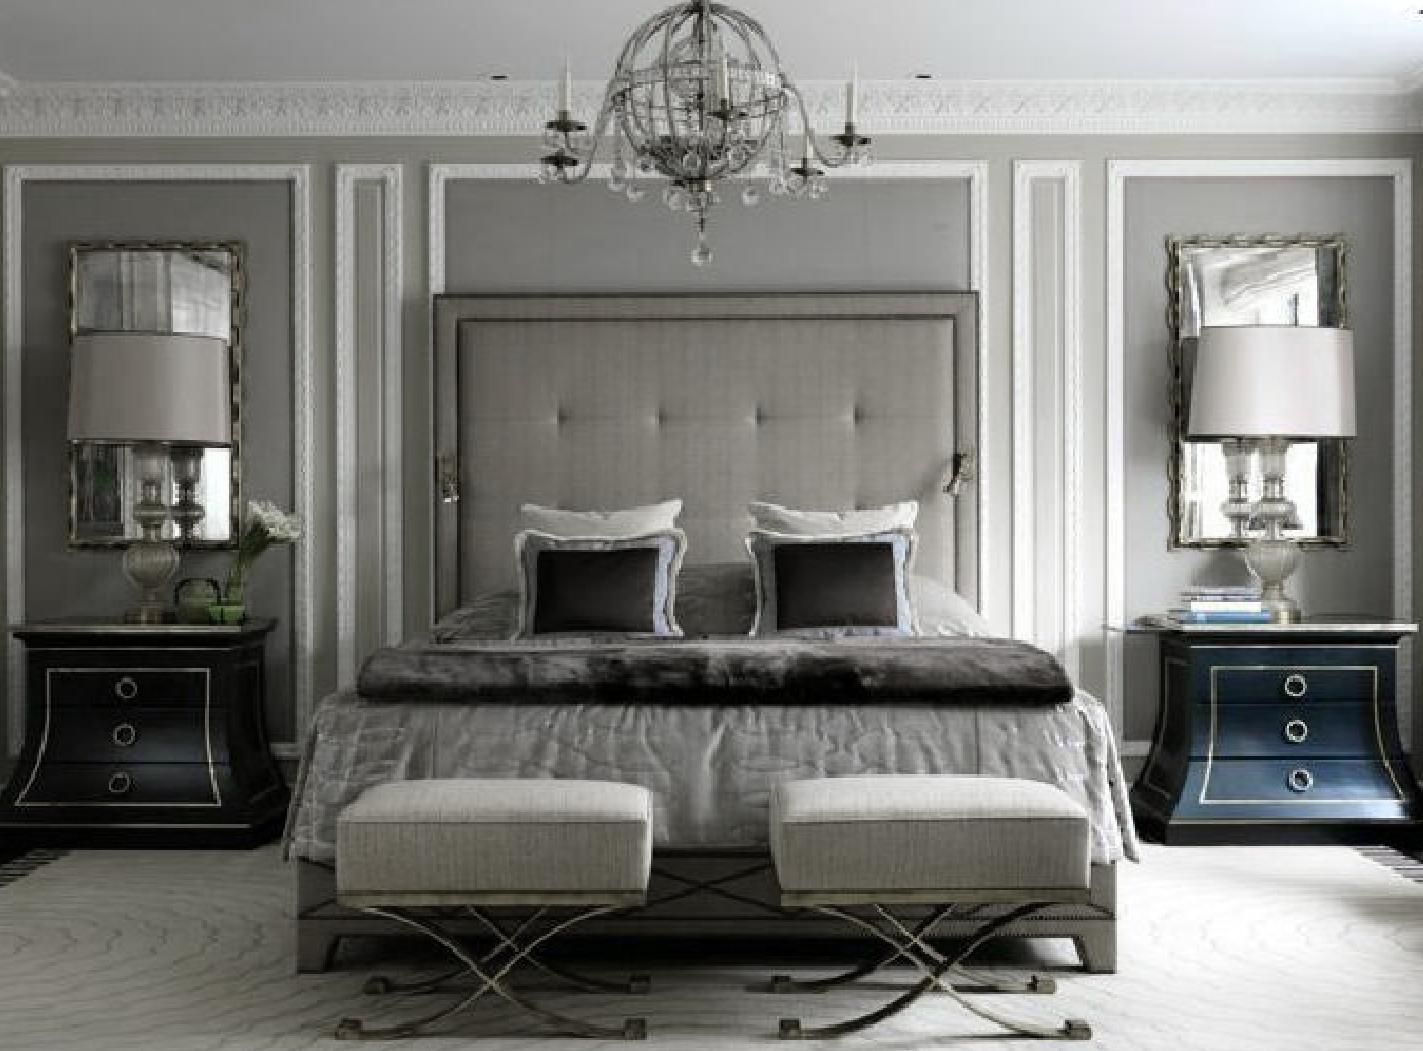 captivating jl deniot paris living room apartm | Dove Gray Home Decor ♅ J L Denoit grey inspired bedroom ...